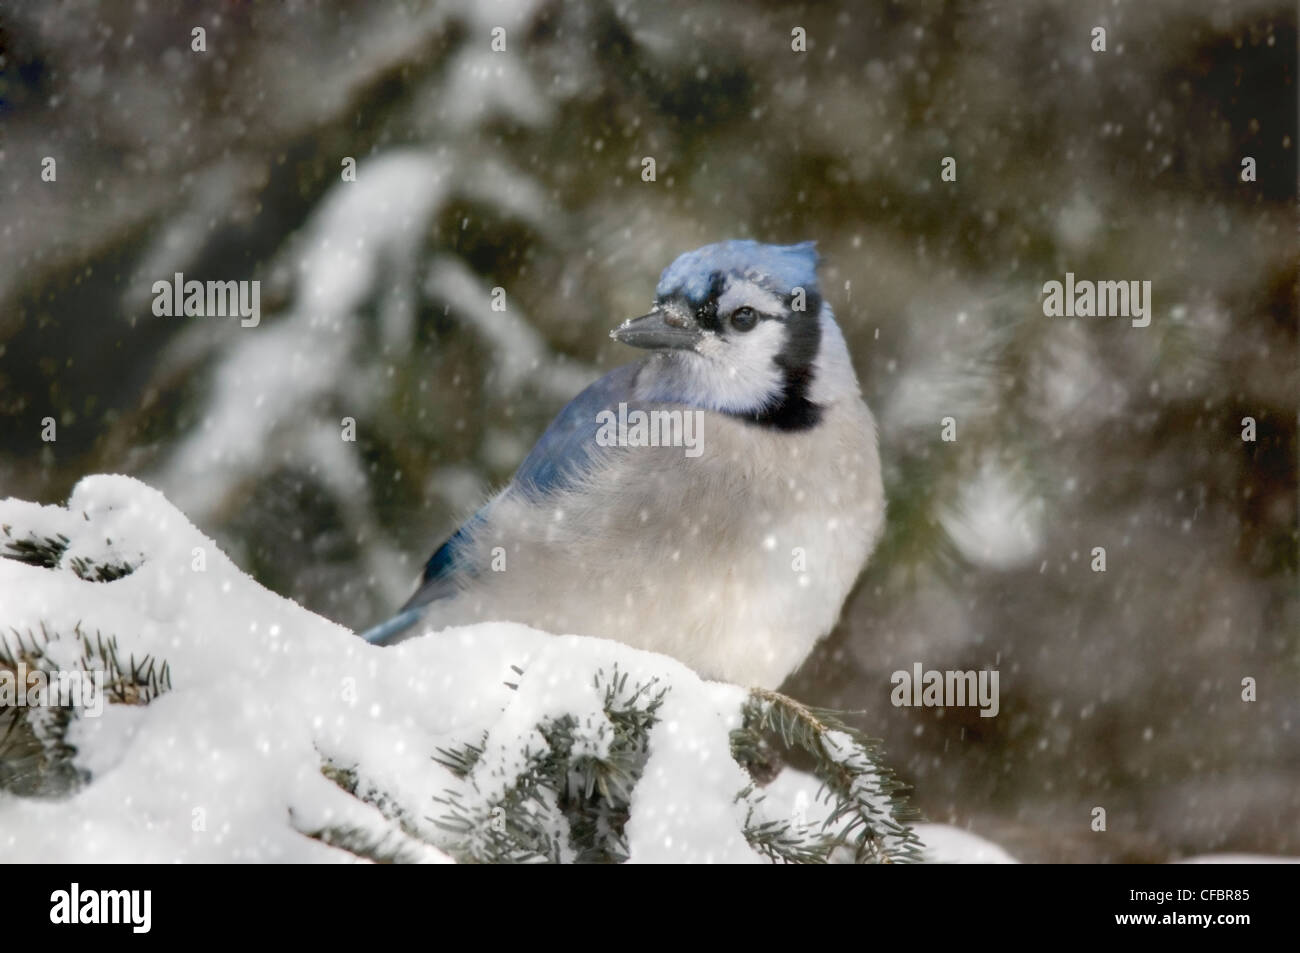 Blue jay (Cyanocitta cristata) sits in snowy spruce tree, Saskatchewan, Canada - Stock Image